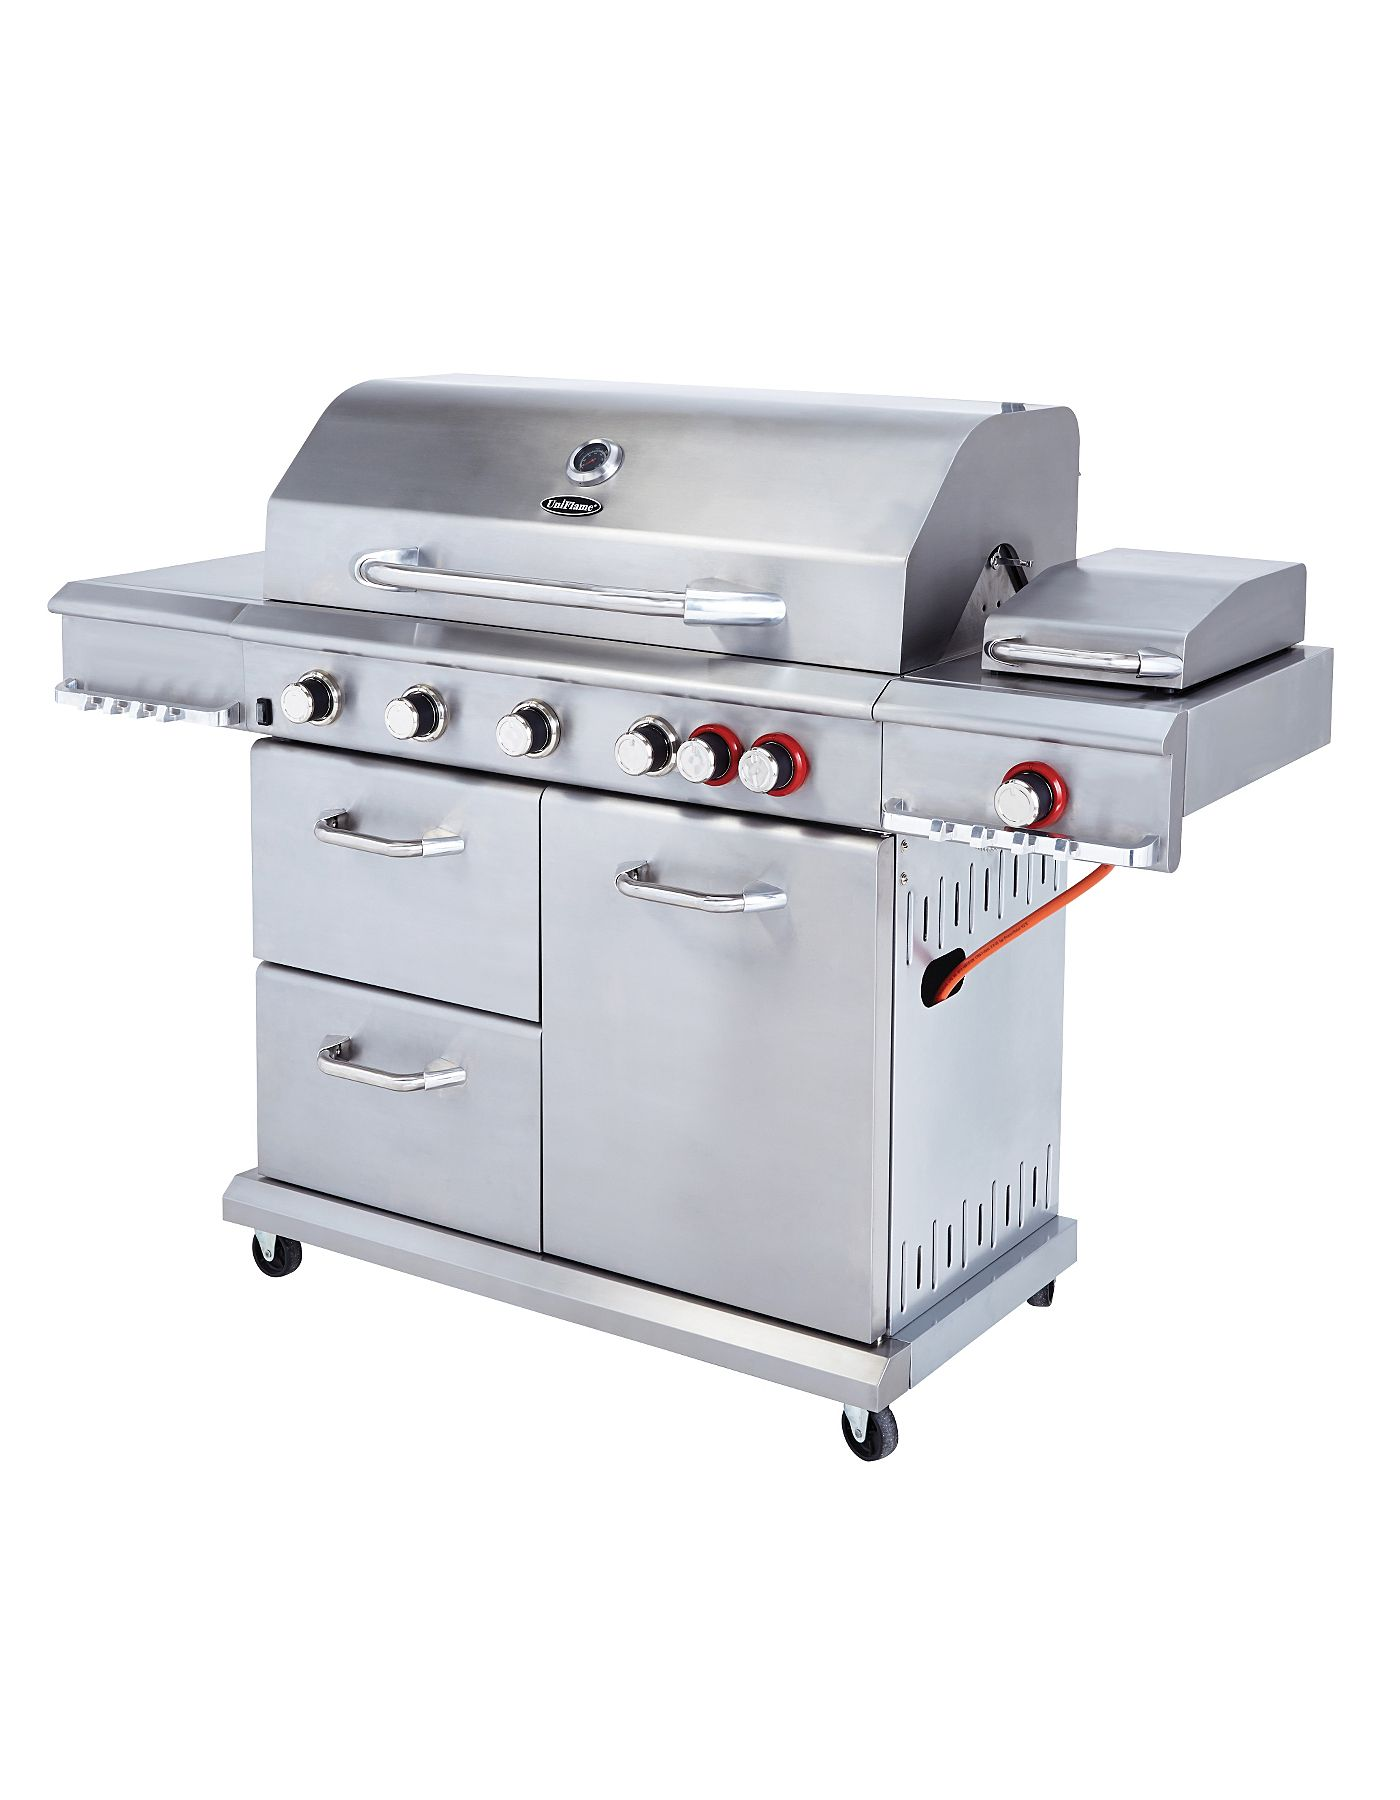 Uniflame dual sear 6 burner side gas grill bbqs heating asda direct